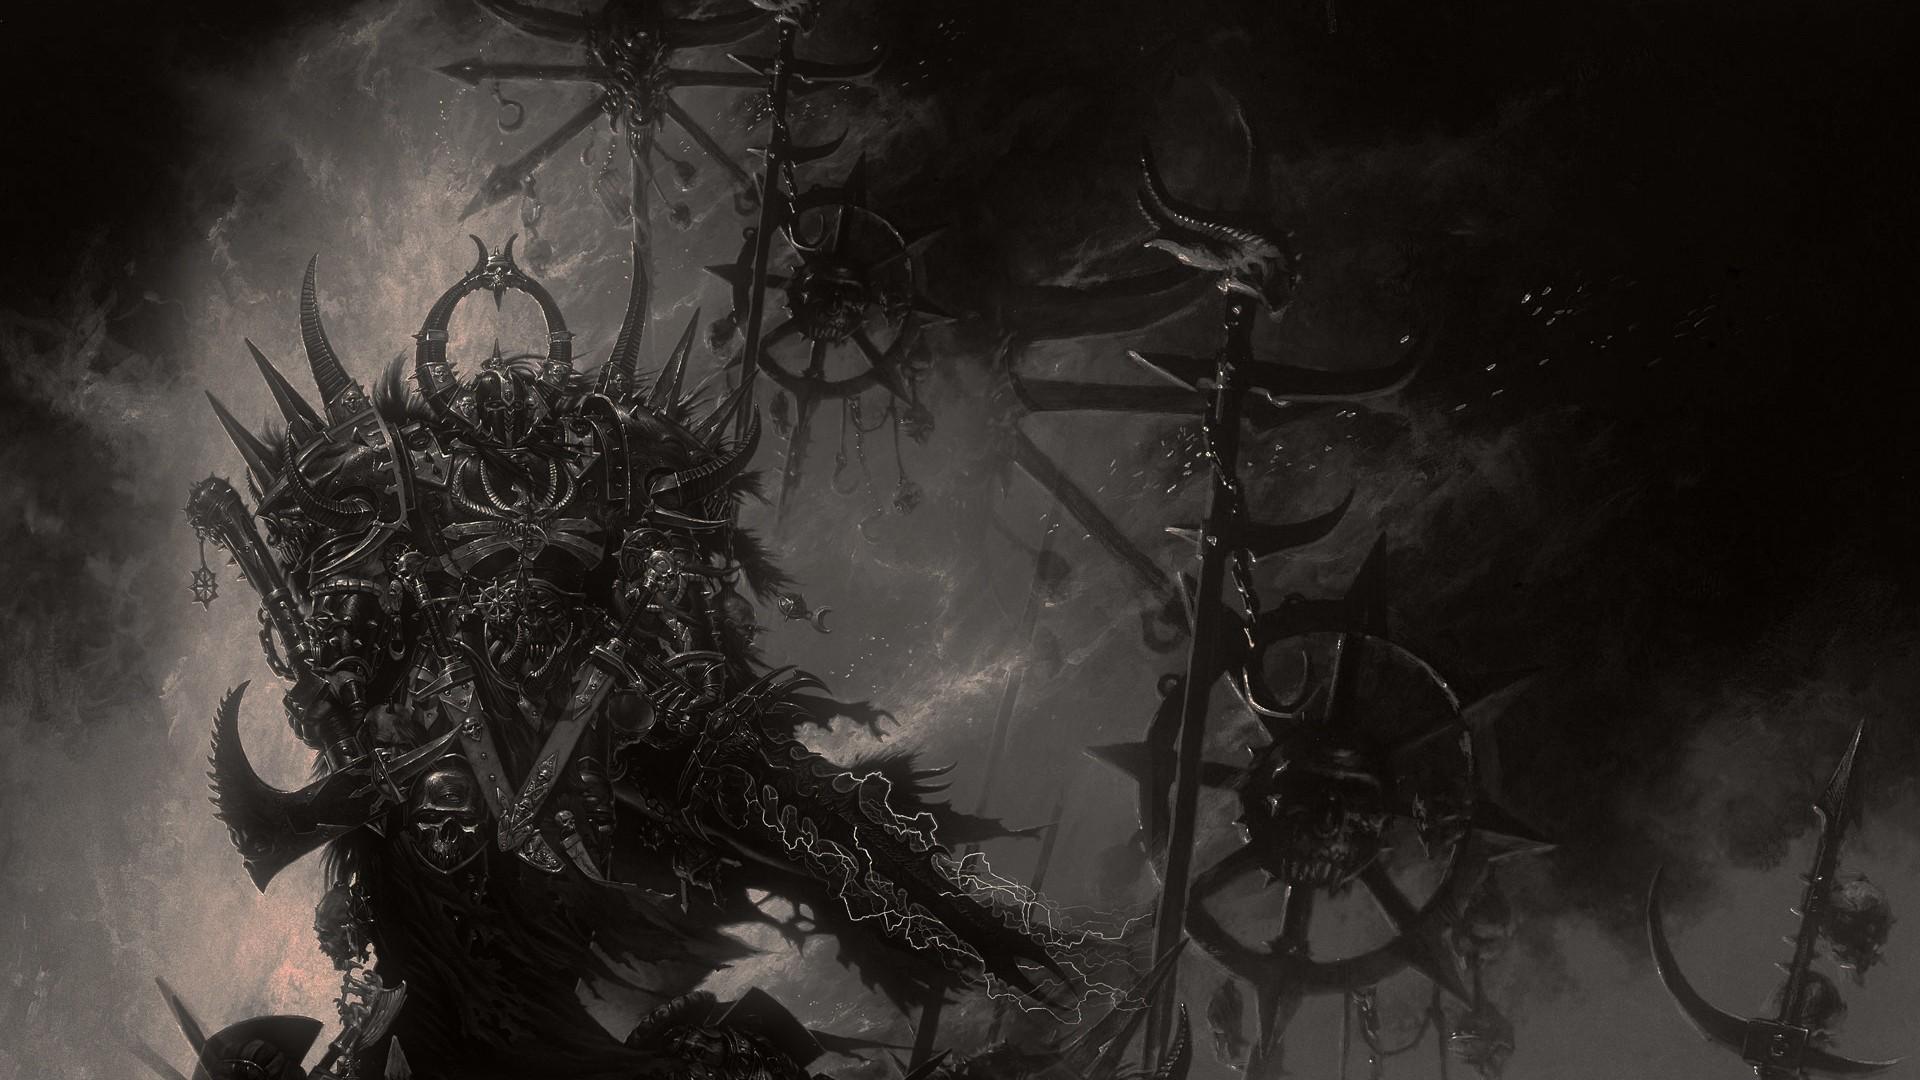 General artwork fantasy art digital art knight dark machine Chaos  Warhammer 40,000 WH40K